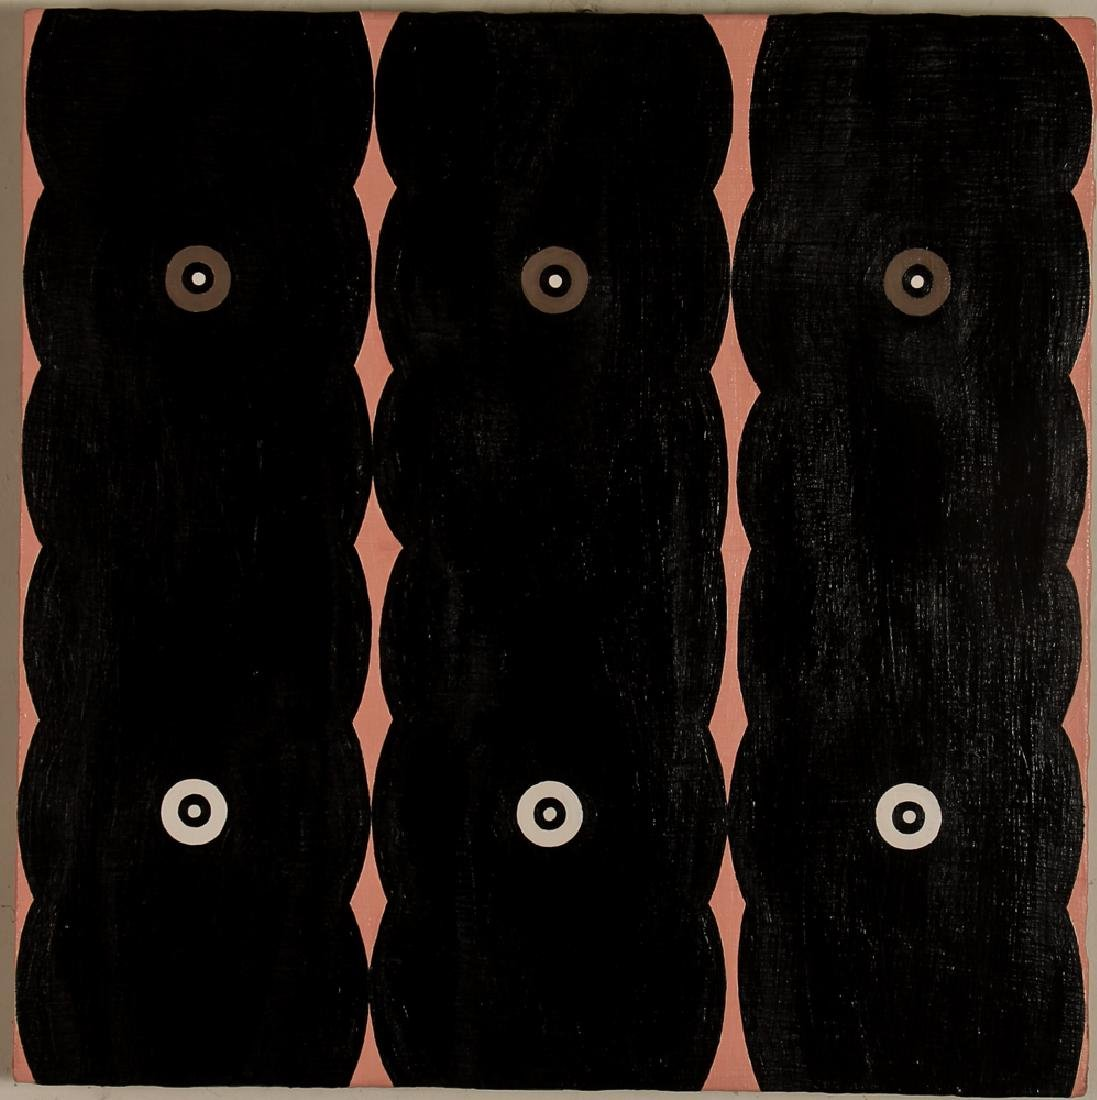 Elizabeth Van Dusen Contemporary Untitled Optical